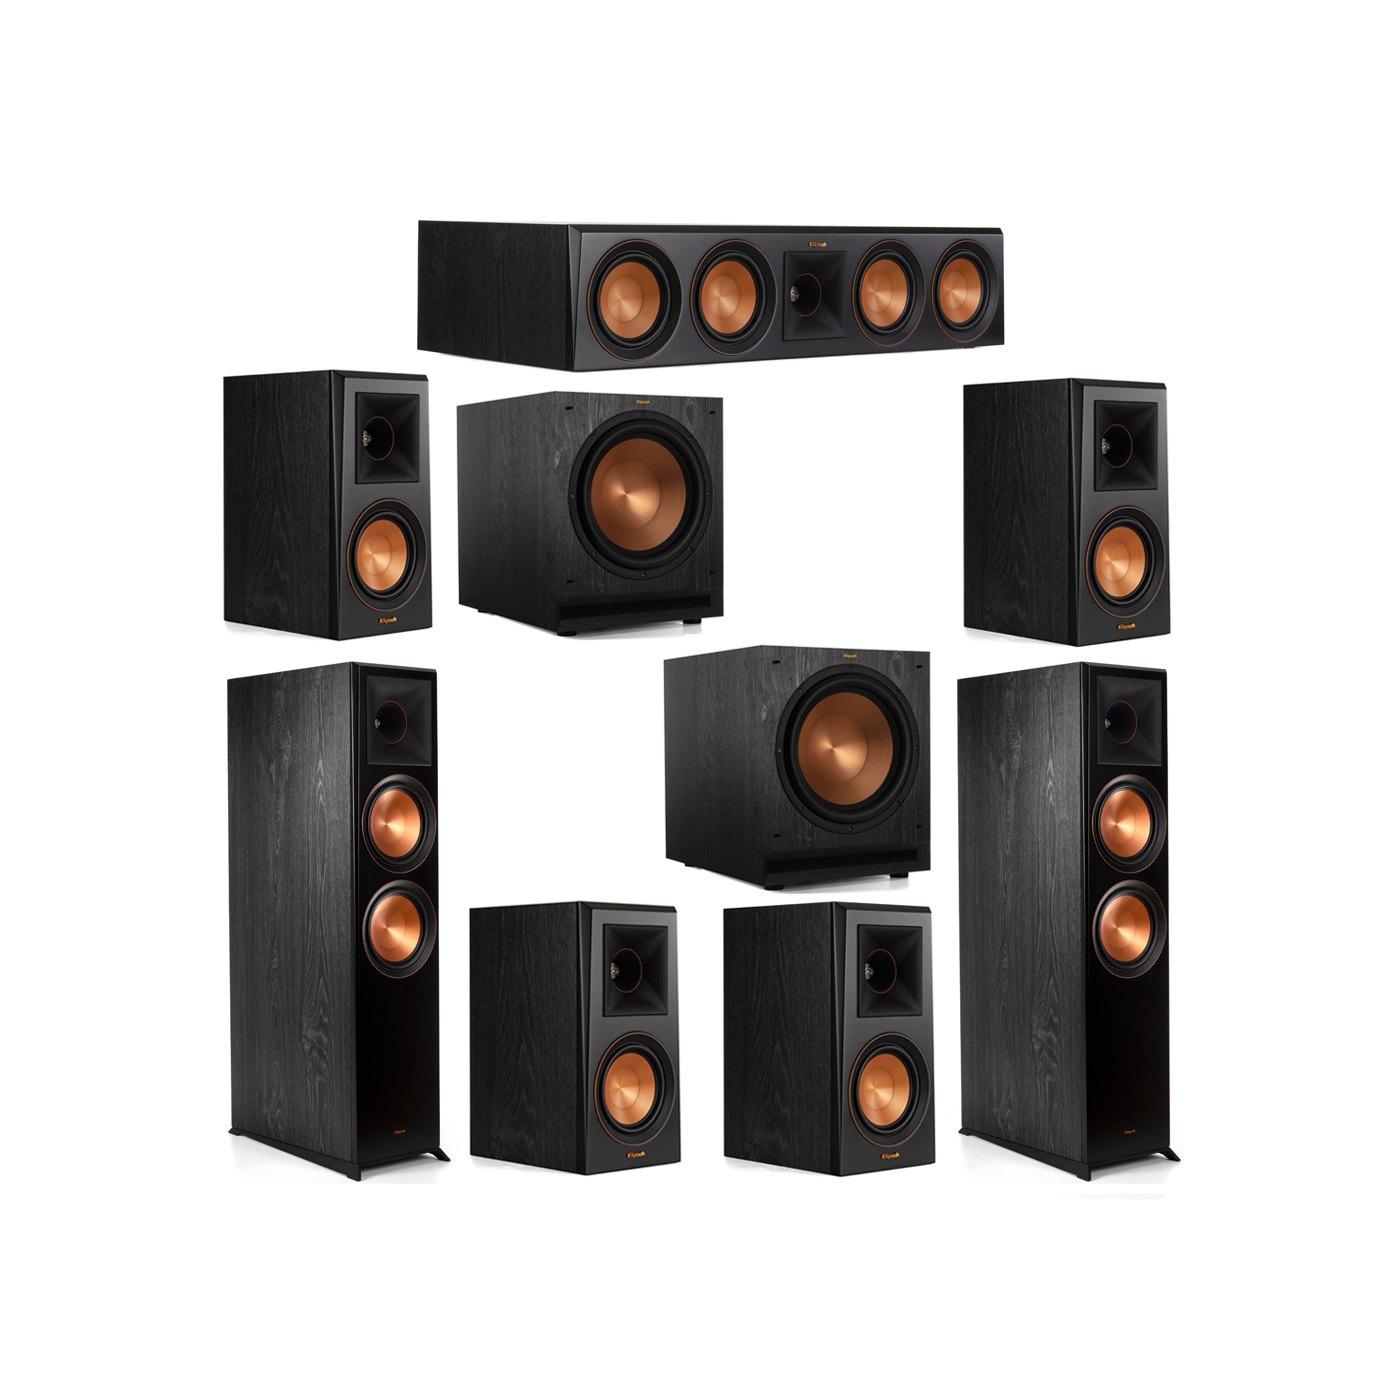 Klipsch 7.2 System with 2 RP-8000F Floorstanding Speakers, 1 Klipsch RP-504C Center Speaker, 4 Klipsch RP-500M Surround Speakers, 2 Klipsch SPL-120 Subwoofers